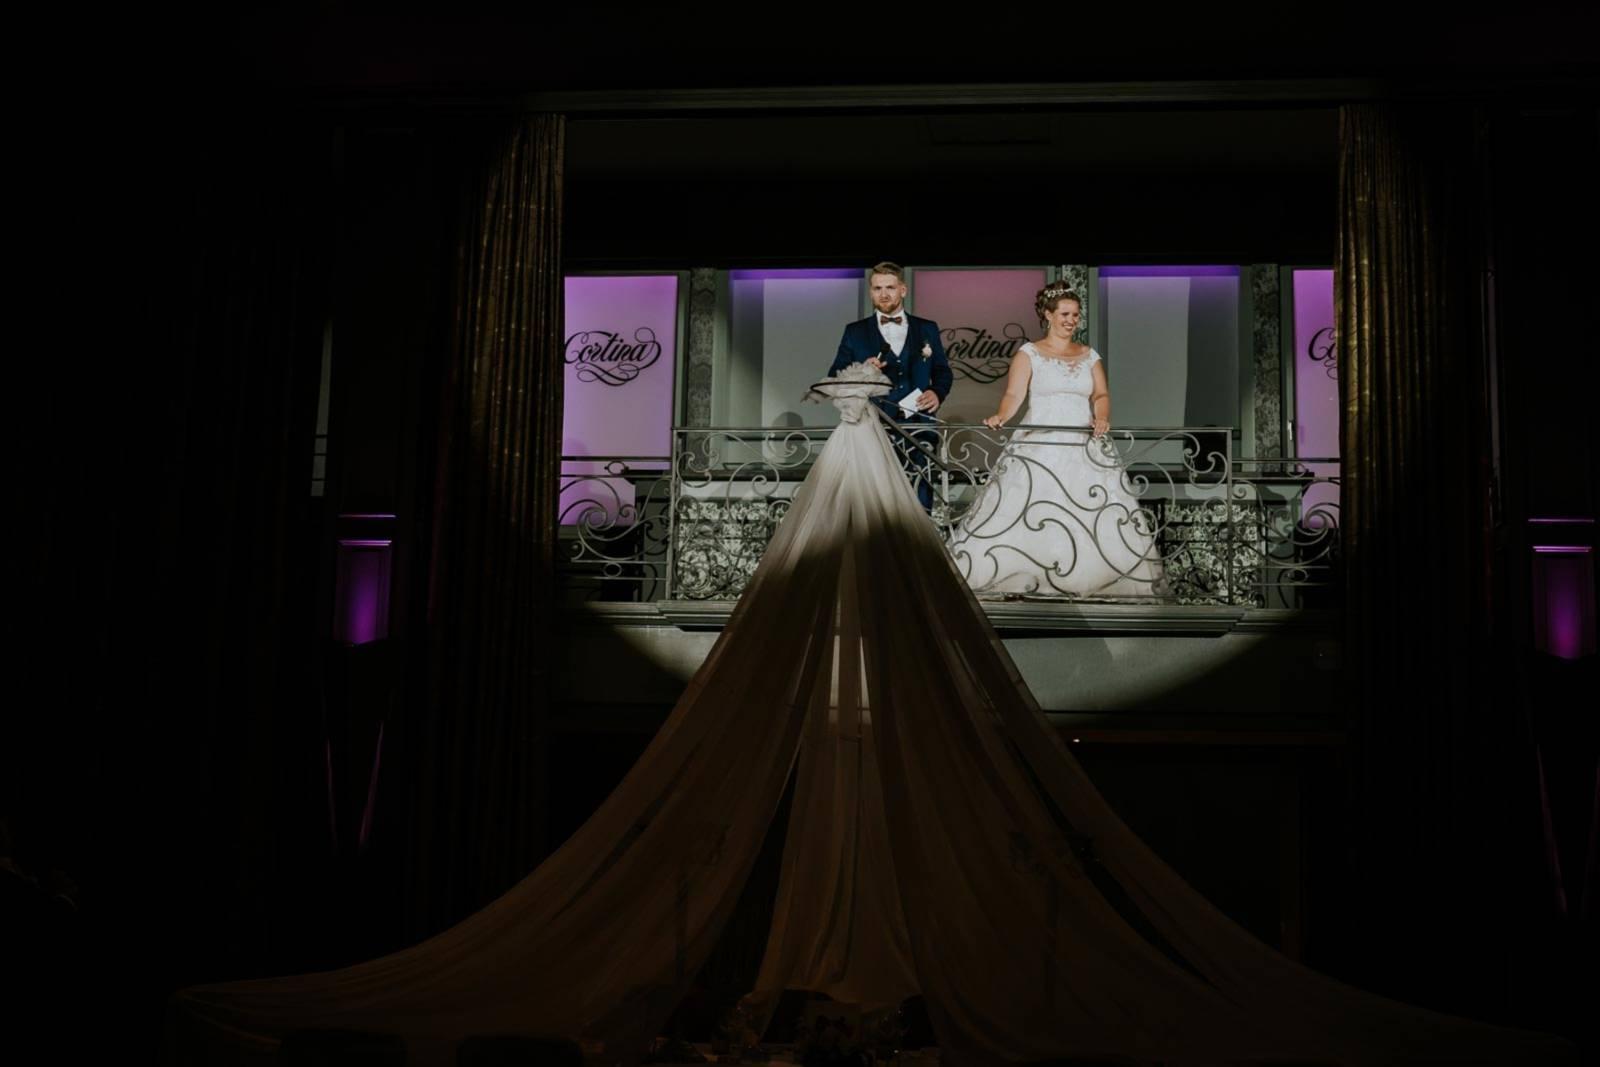 Cortina Wevelgem - Feestzaal - House of Weddings (23)